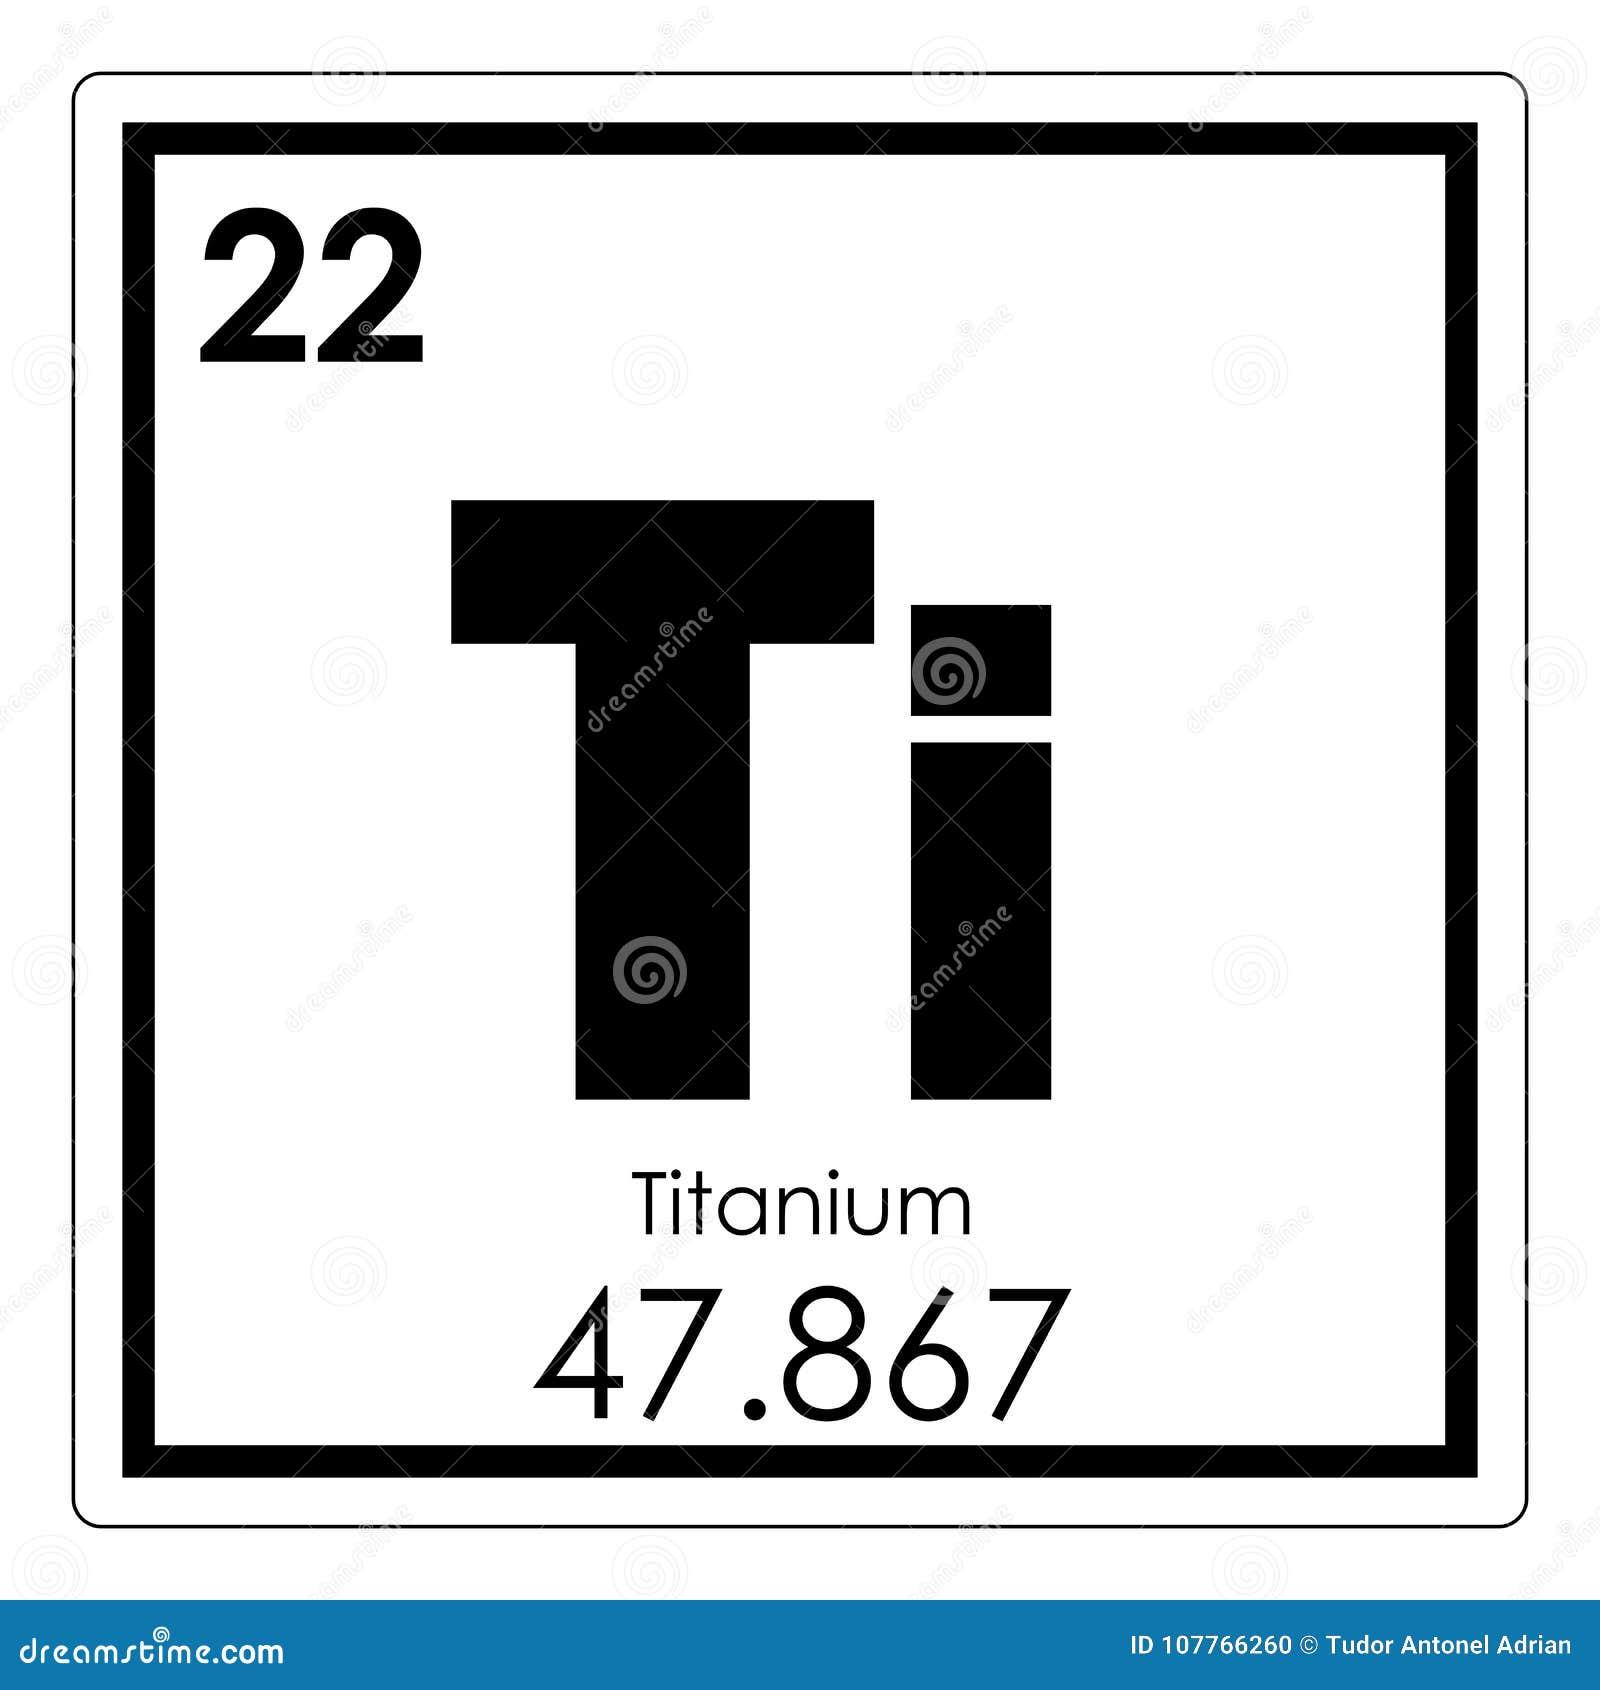 Titanium chemical element stock illustration illustration of symbol titanium chemical element urtaz Choice Image